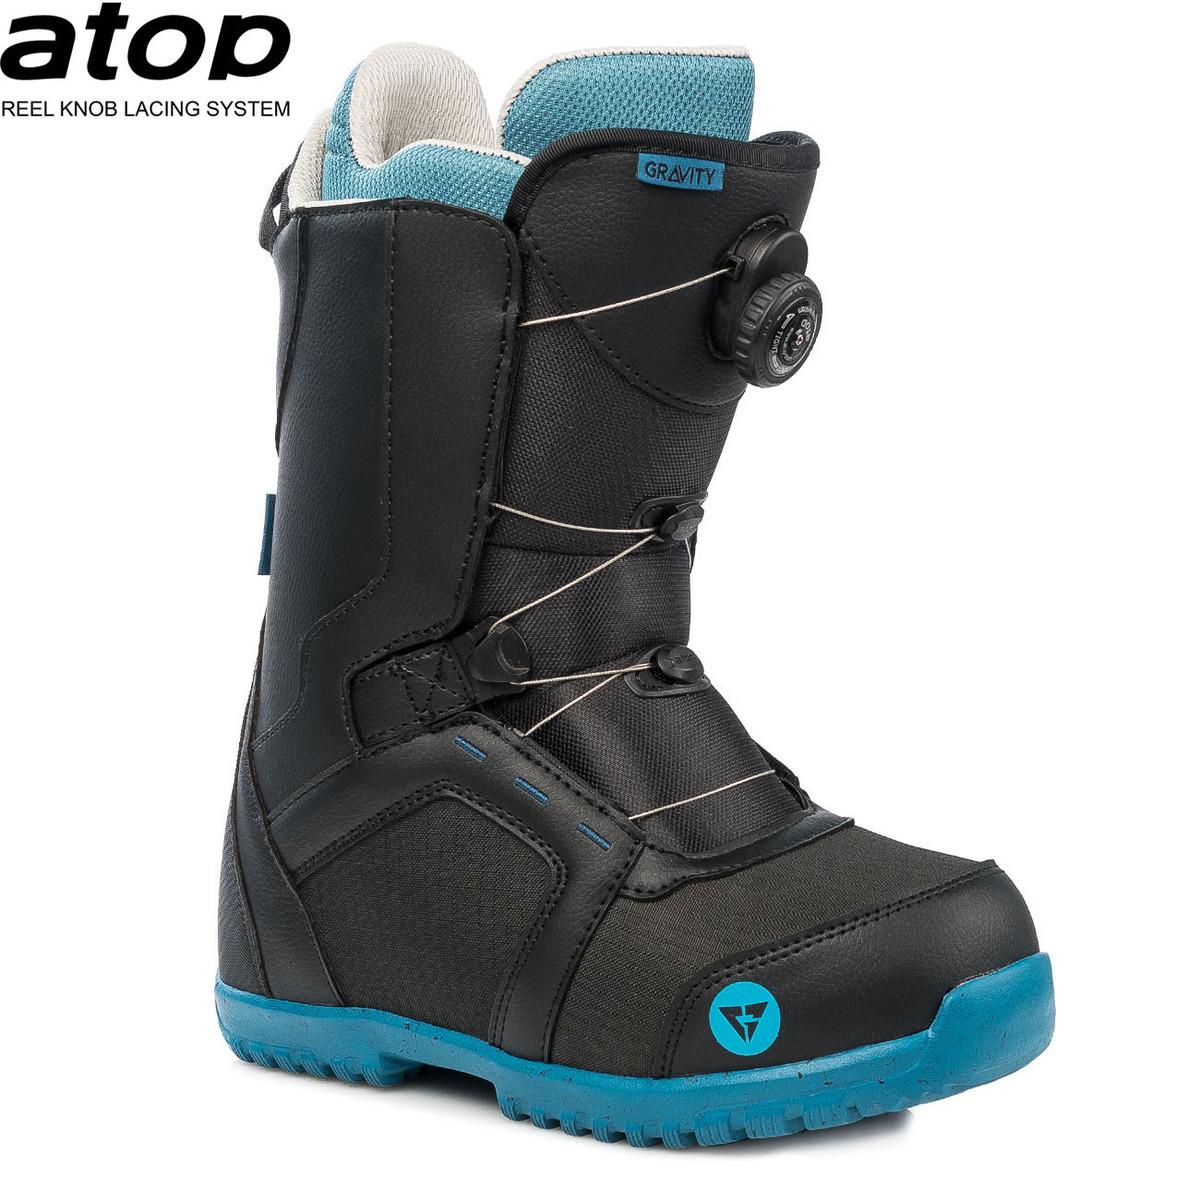 Snowboardové boty Gravity Micro Boys Atop 19/20 5 (38)